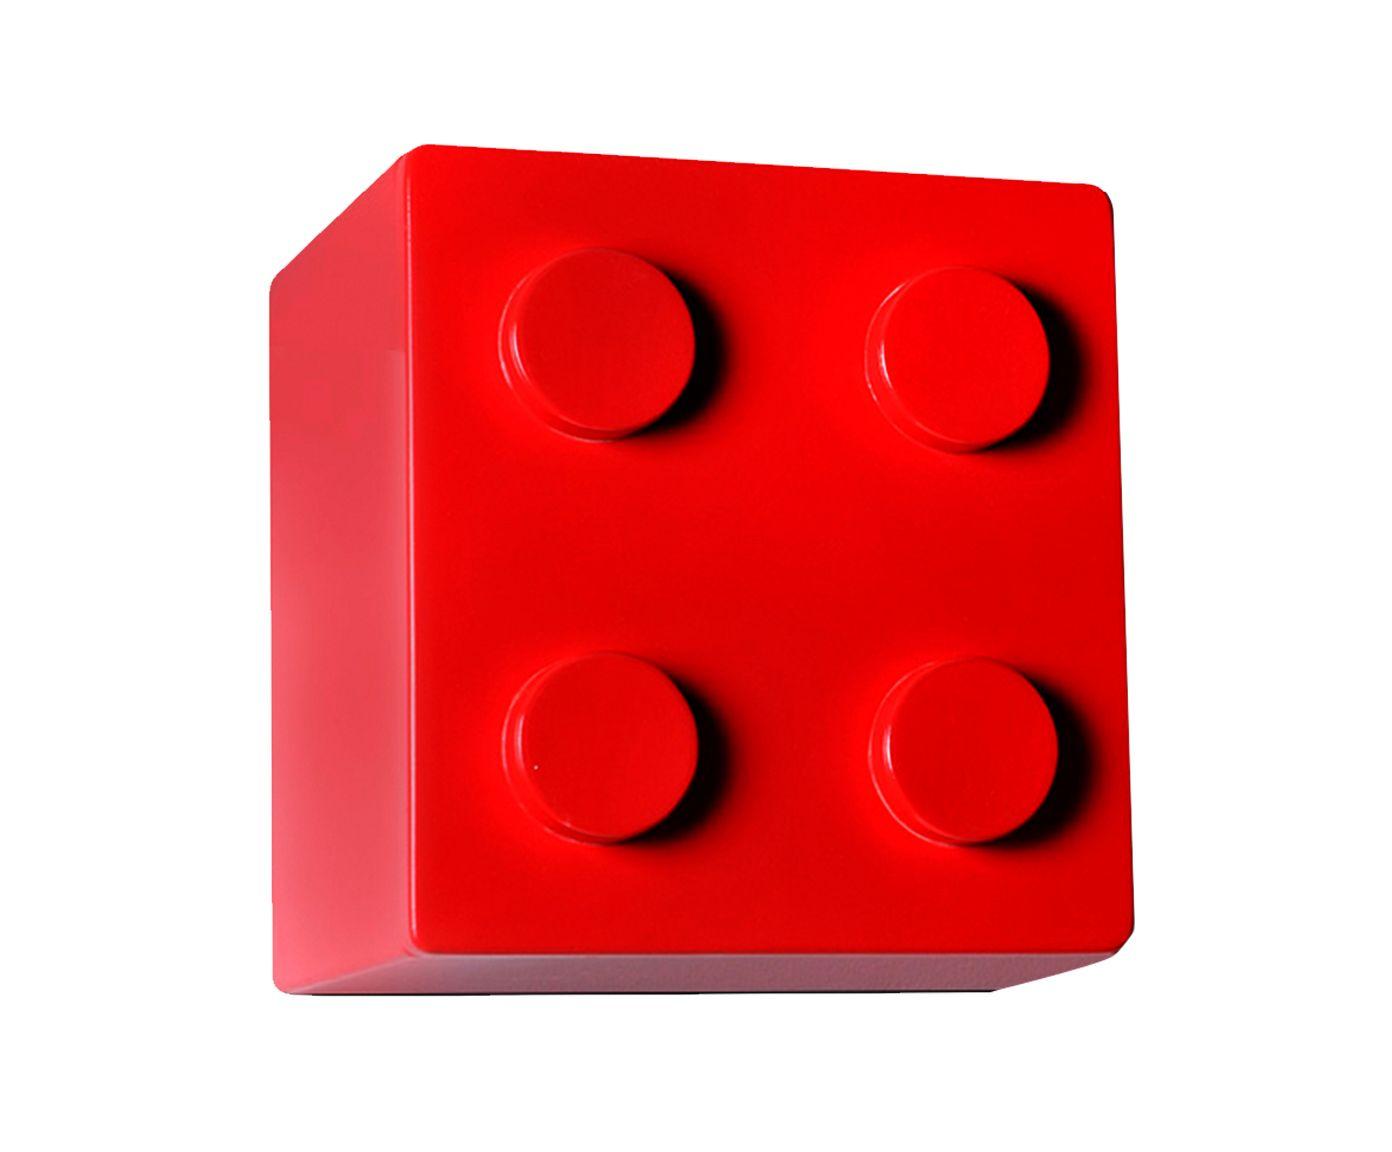 Nicho Lego Vermelho - 30X30X27cm | Westwing.com.br